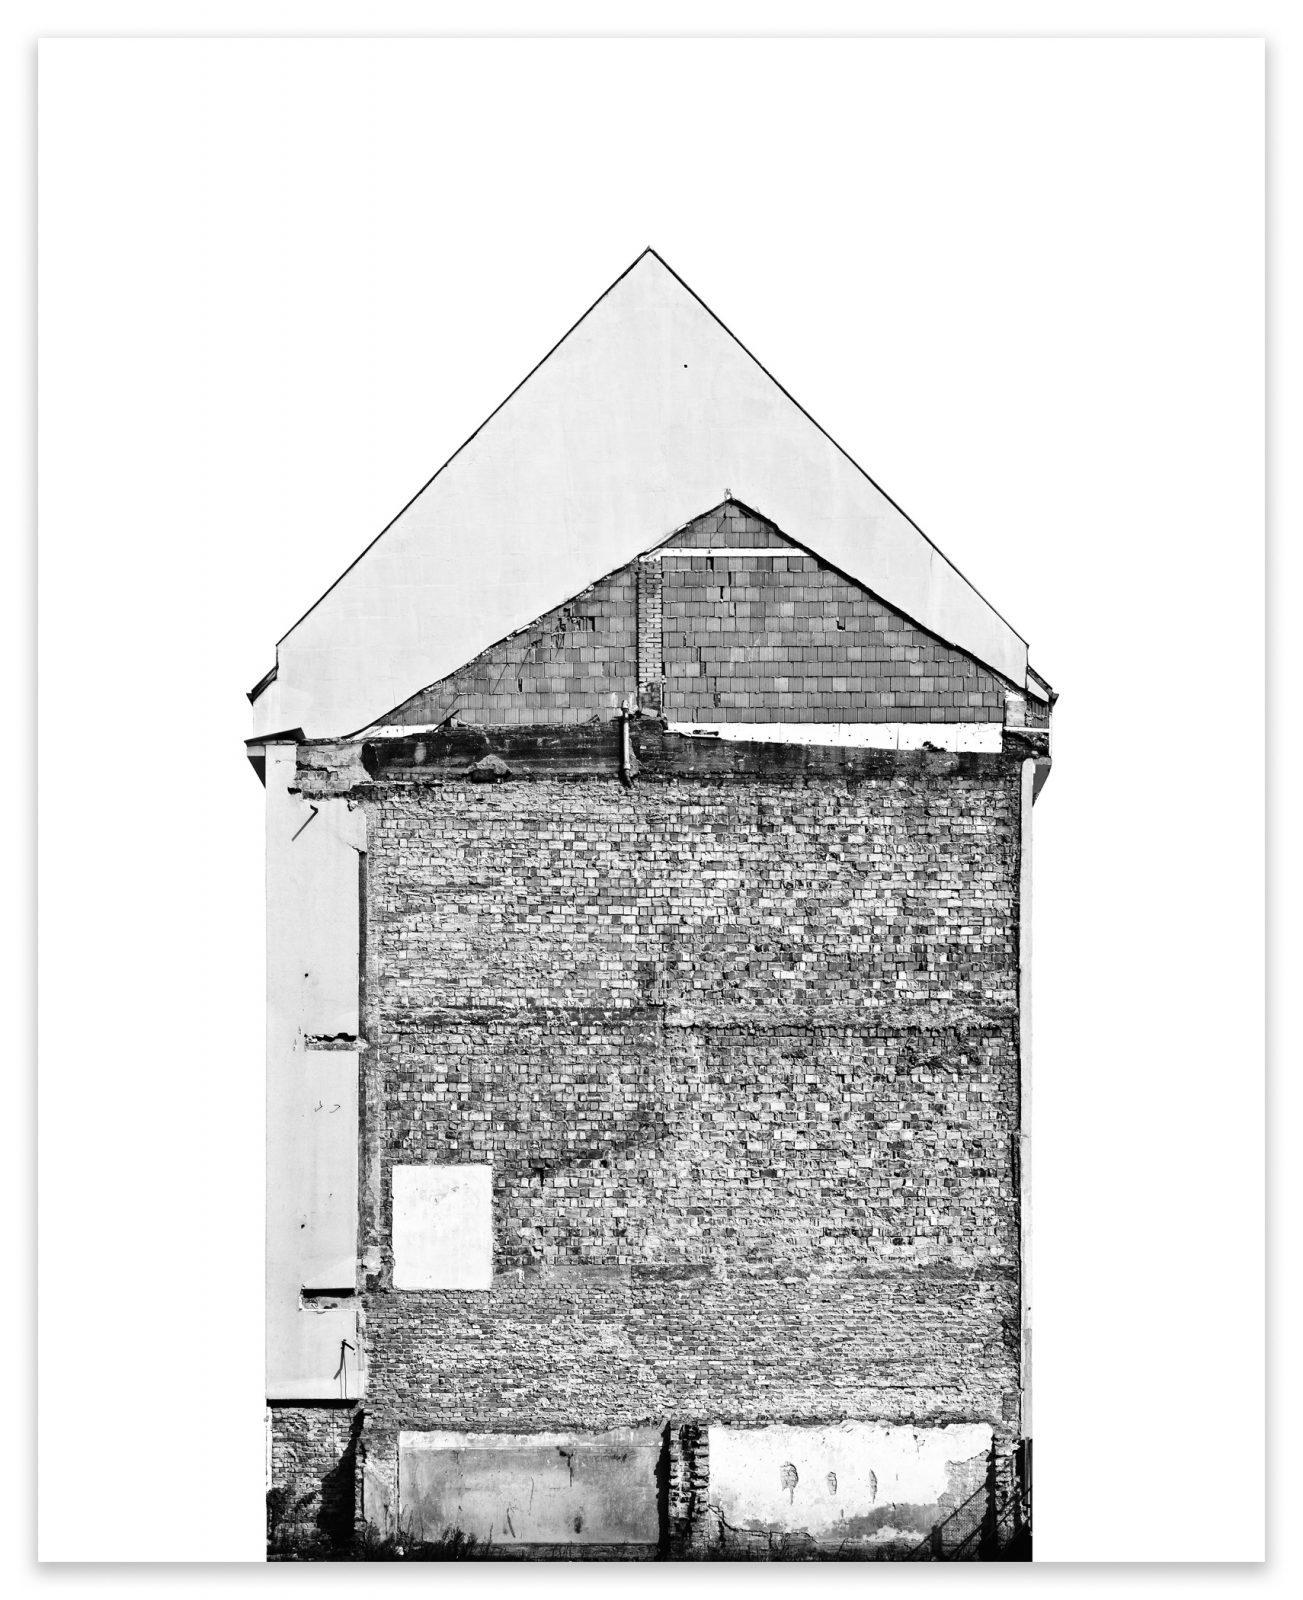 Akos Czigany: Home 1097-1100